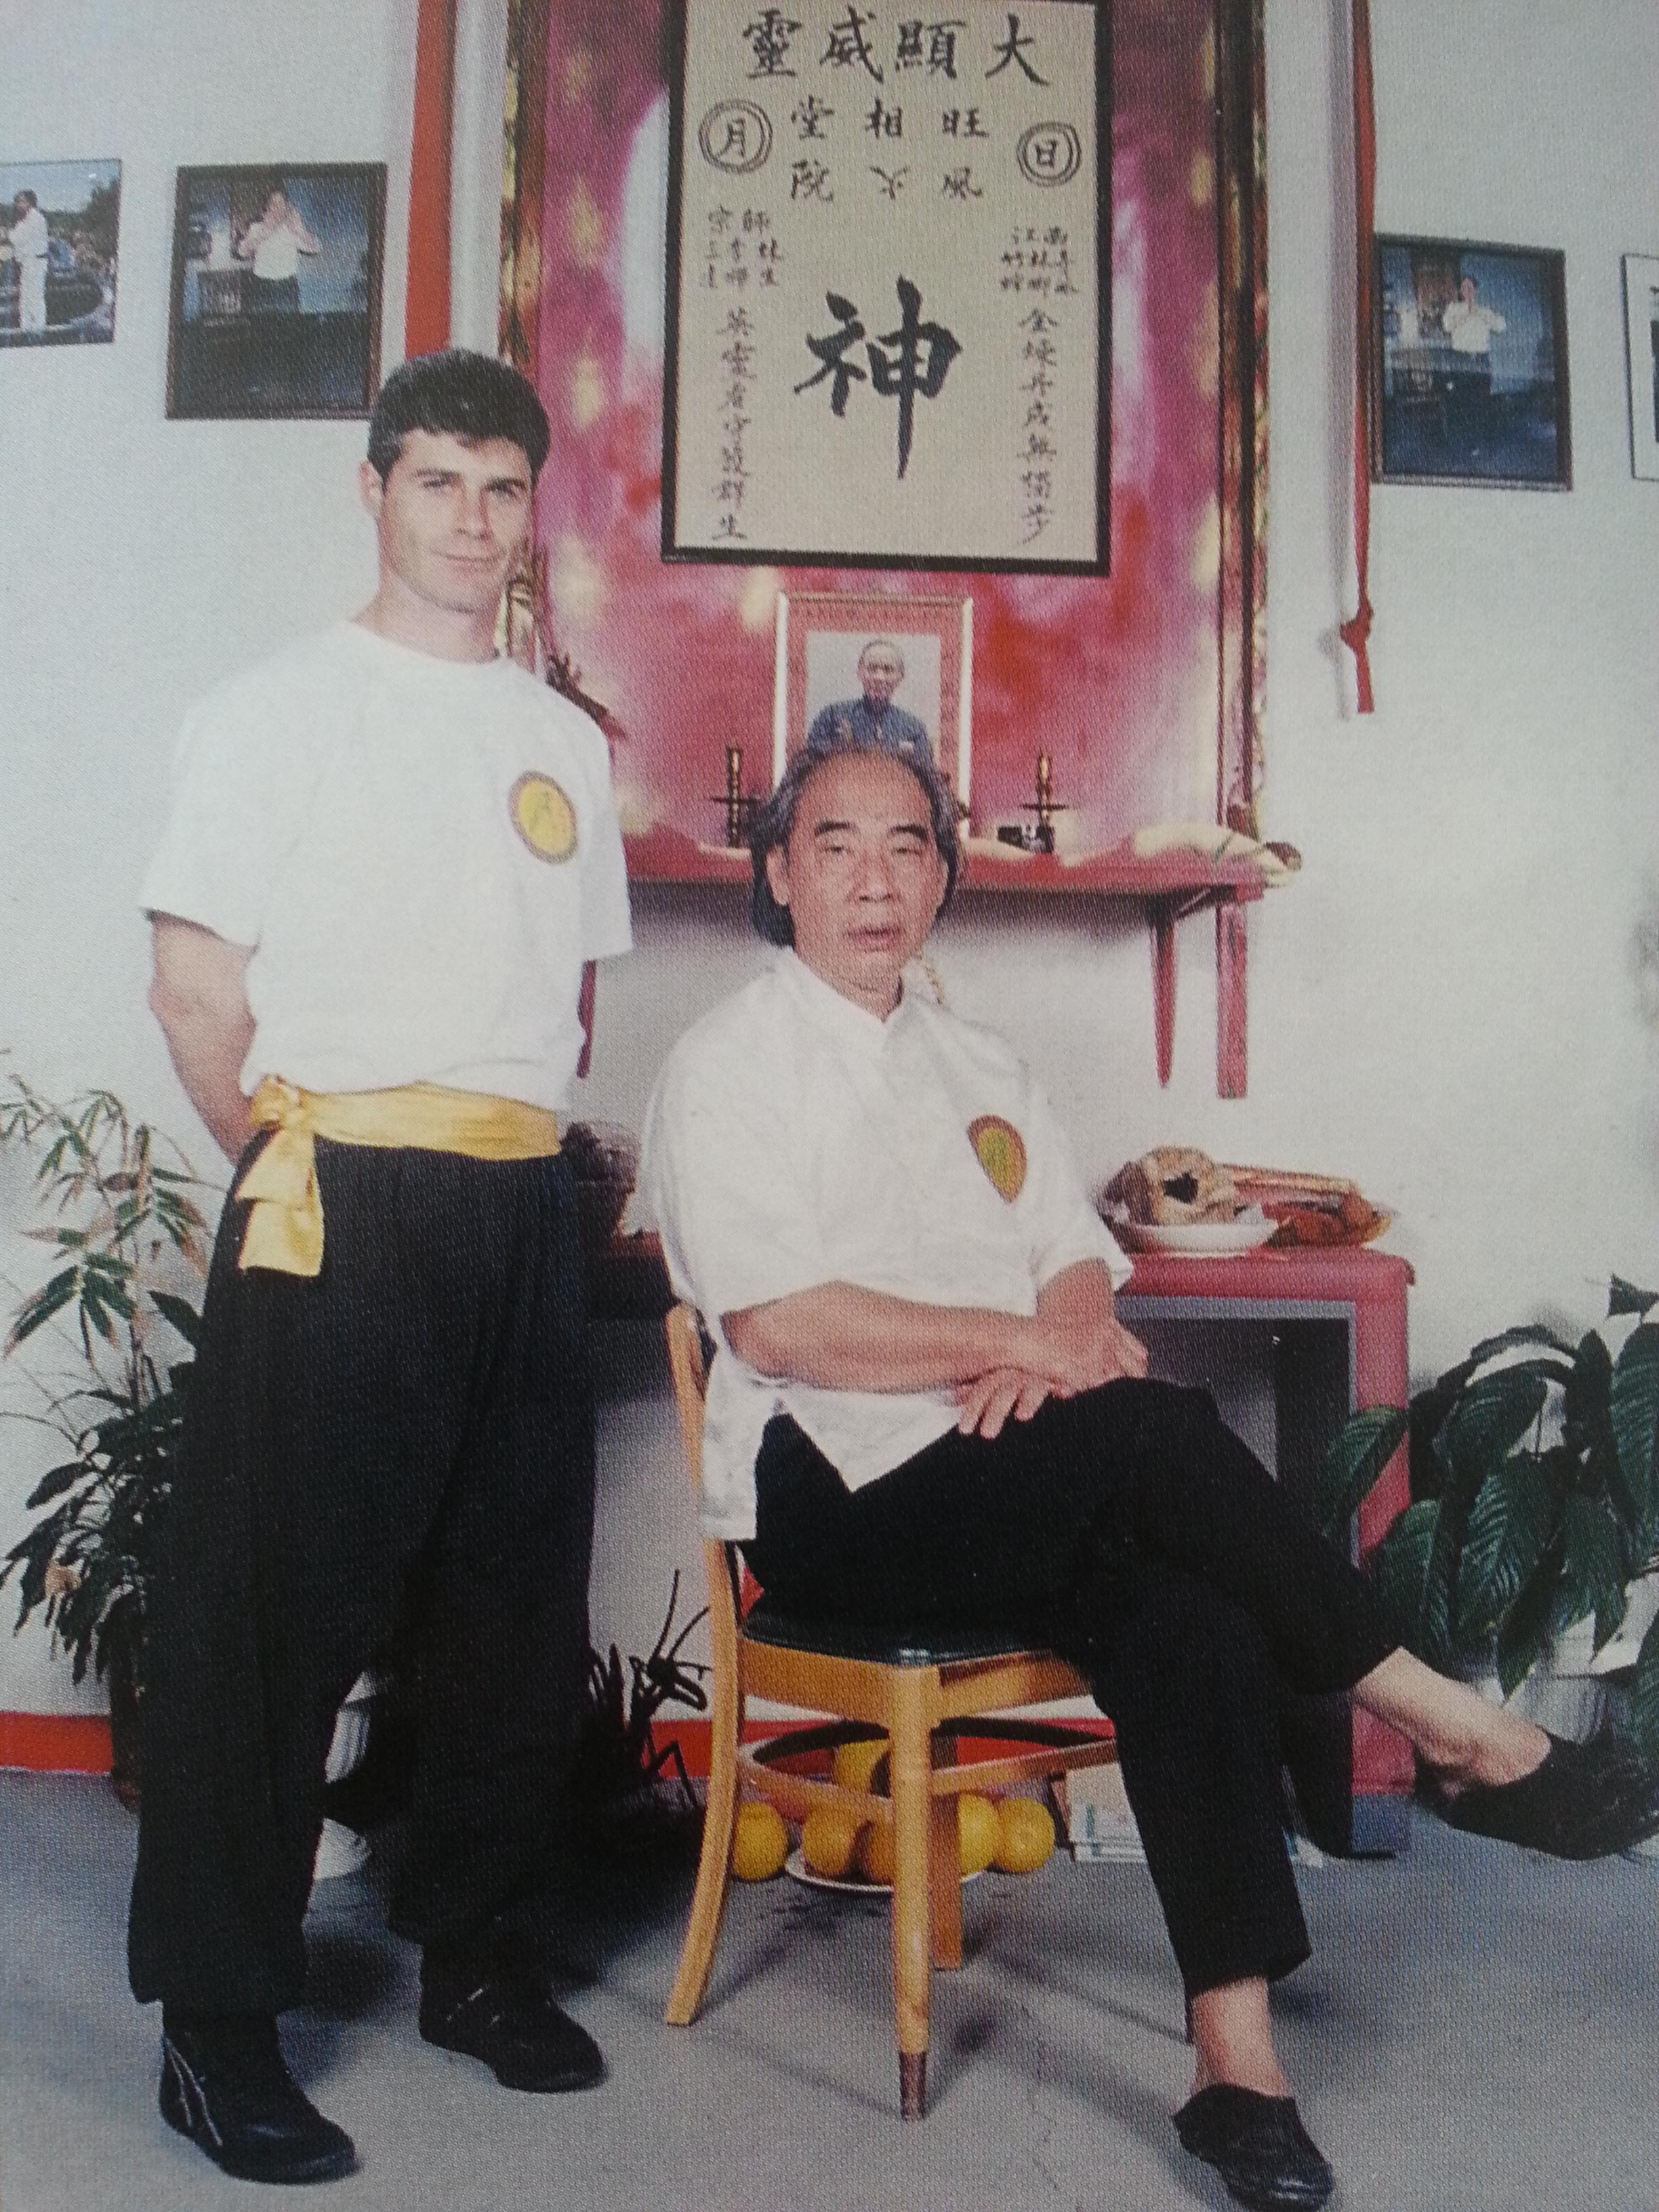 sifu - Sapir Tal - self defense classes - kung fu training